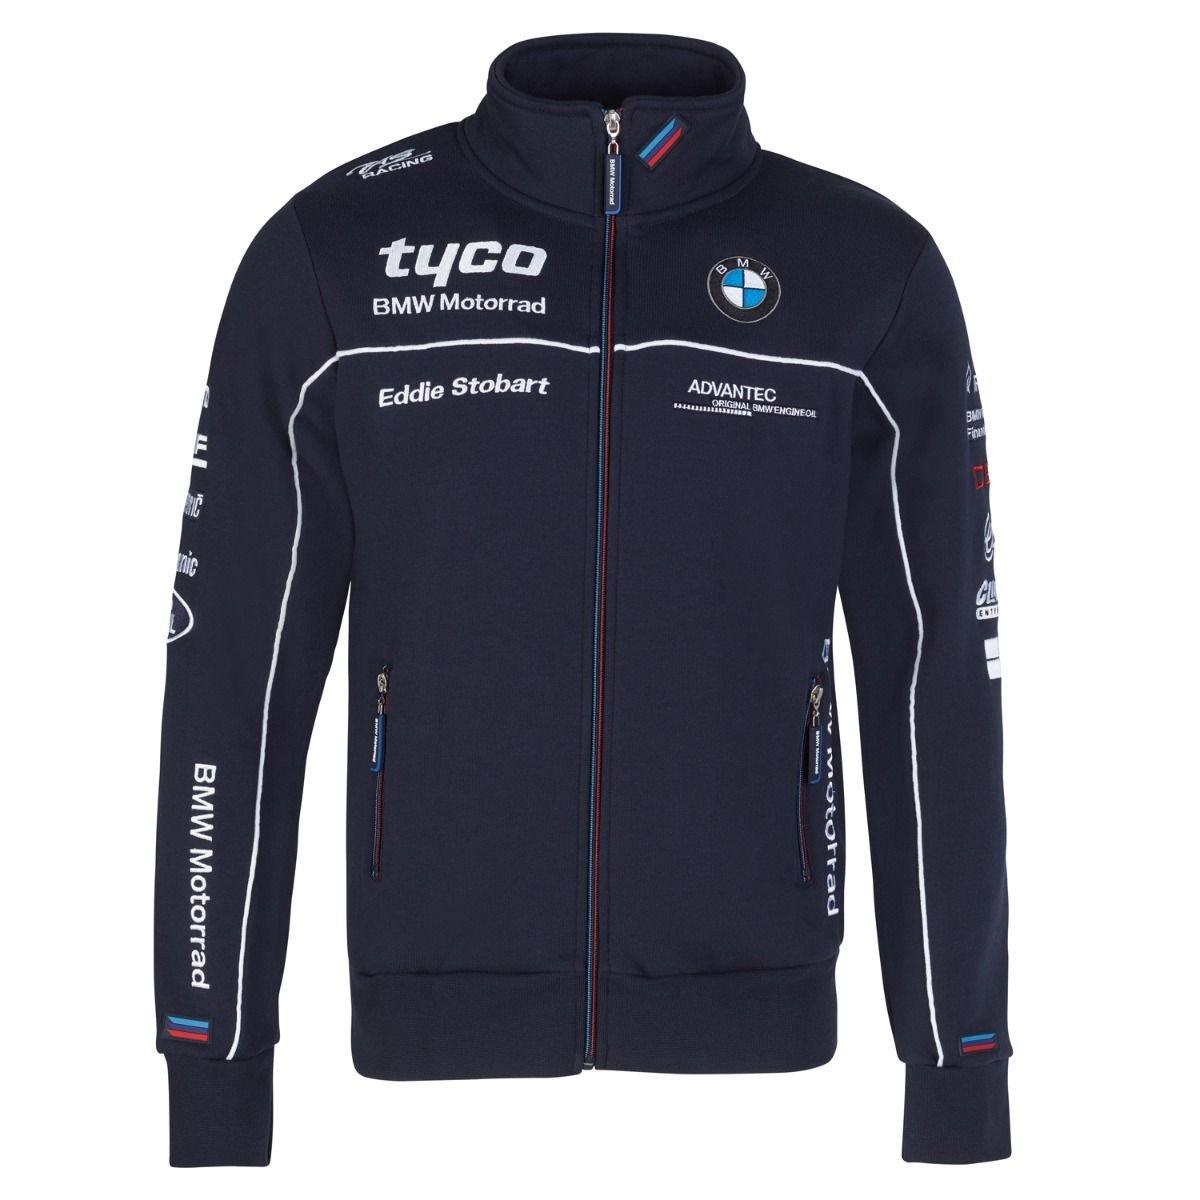 CLINTON ENTERPRISES Mikina Tyco BMW Track Top 2018 - Motostar.cz a0f16423a82